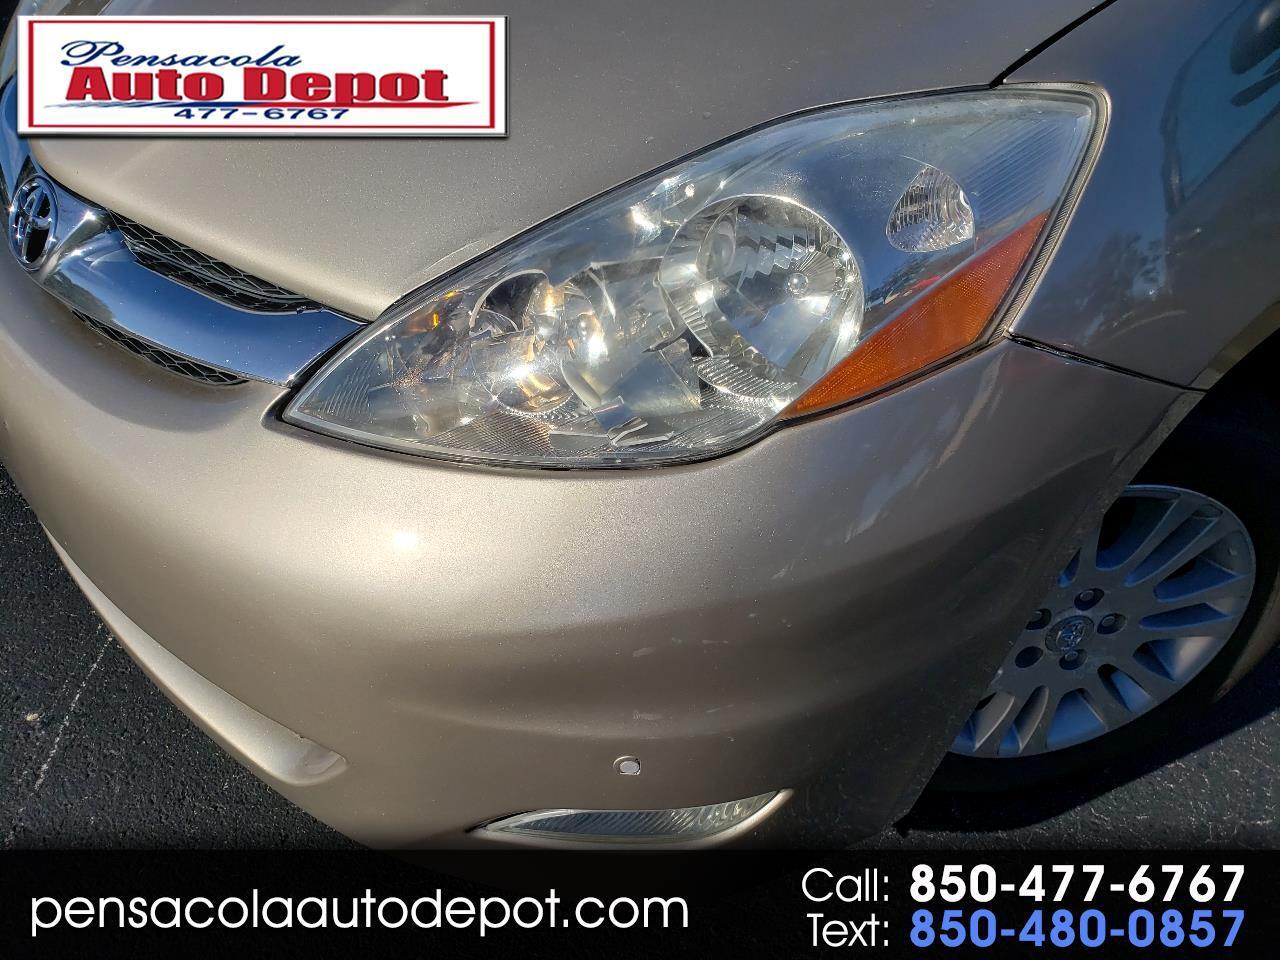 Toyota Sienna XLE Limited AWD 2008